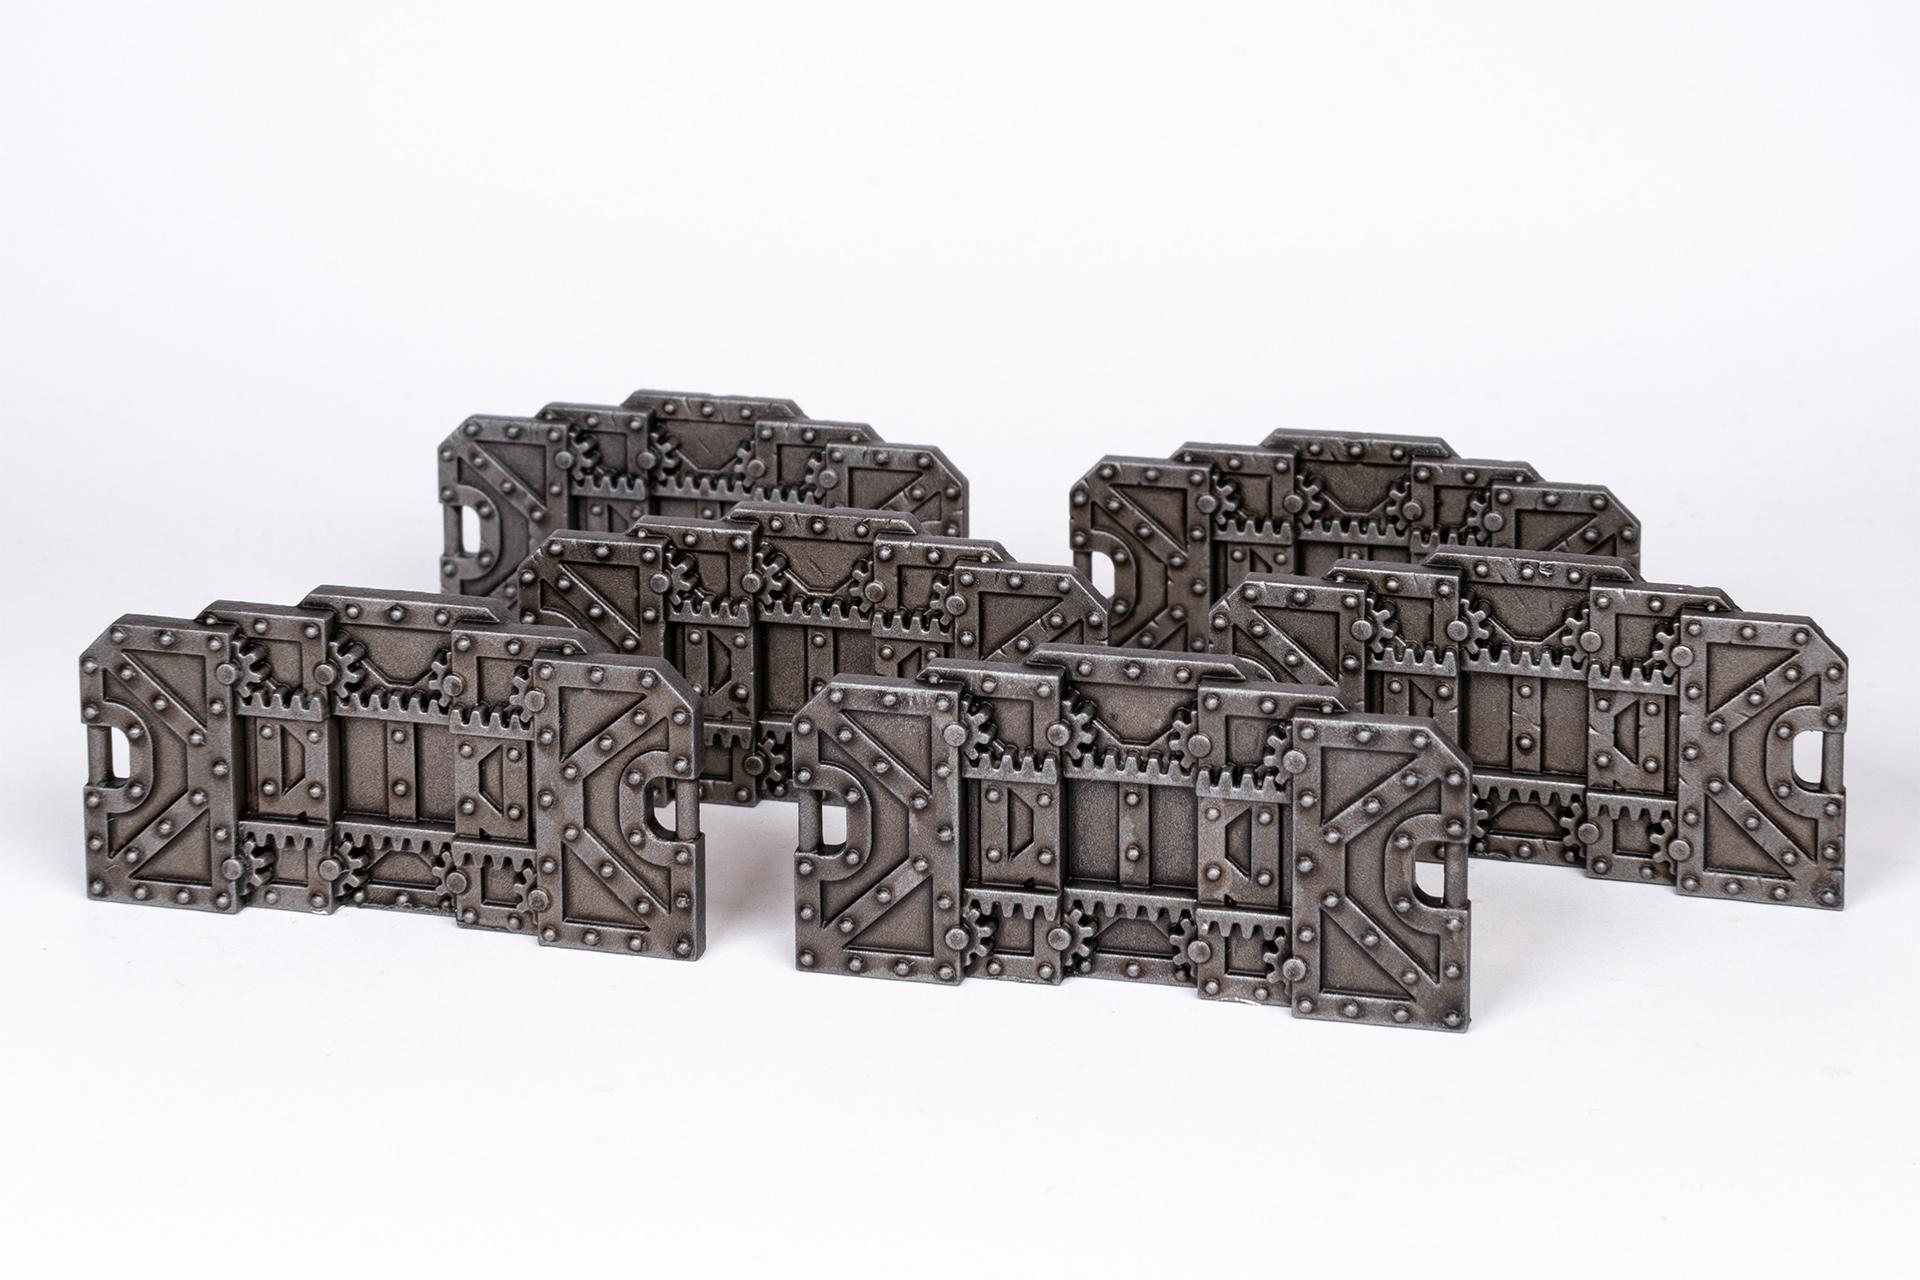 Kill Team Octarius barricades